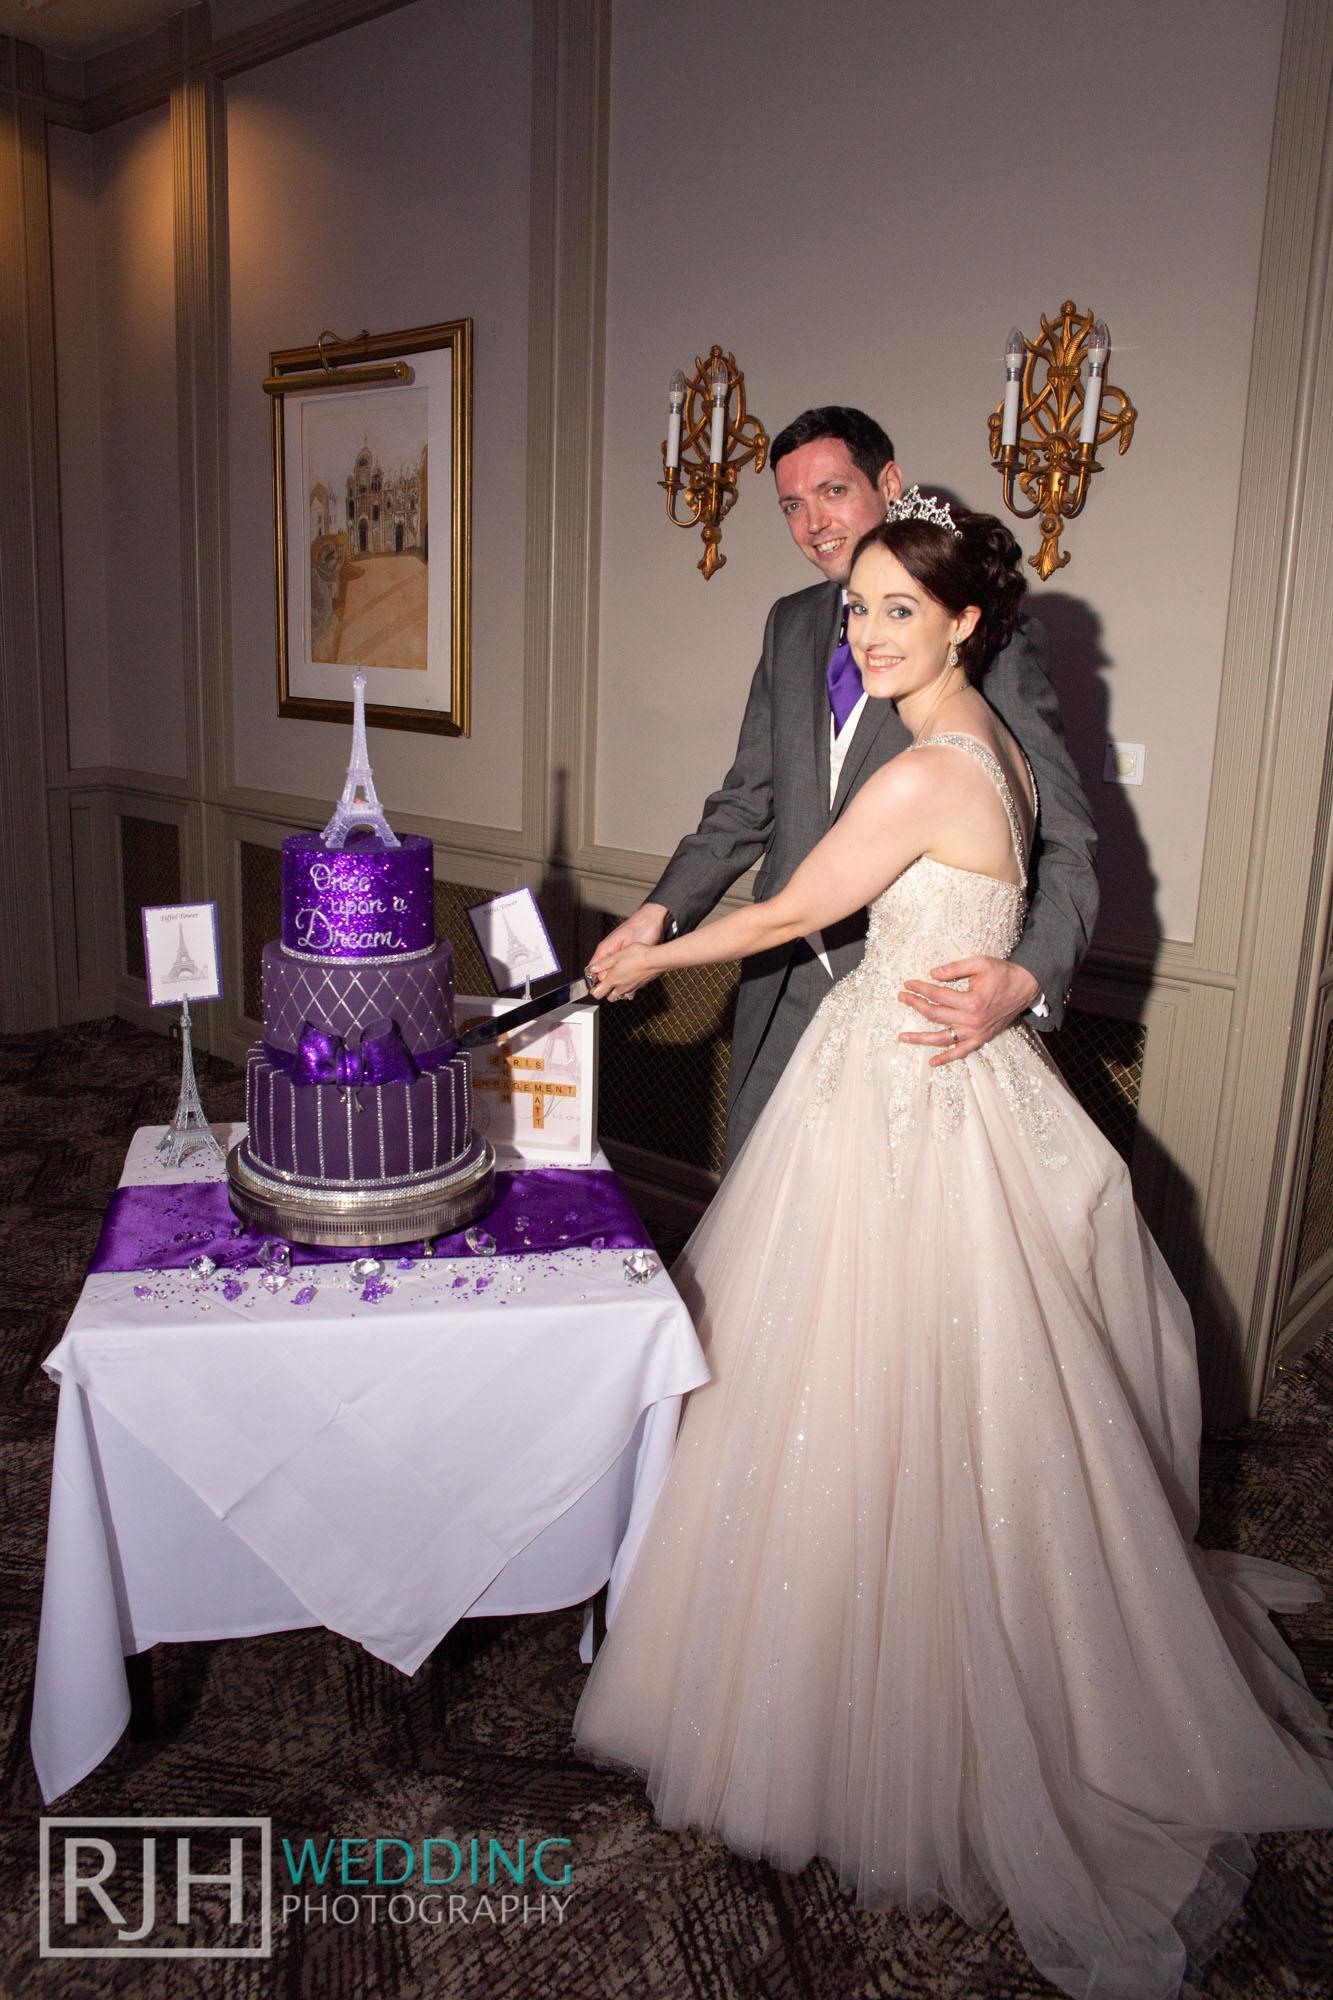 Oulton Hall Wedding Photography_Goodwill-Hall_052_IMG_6948.jpg